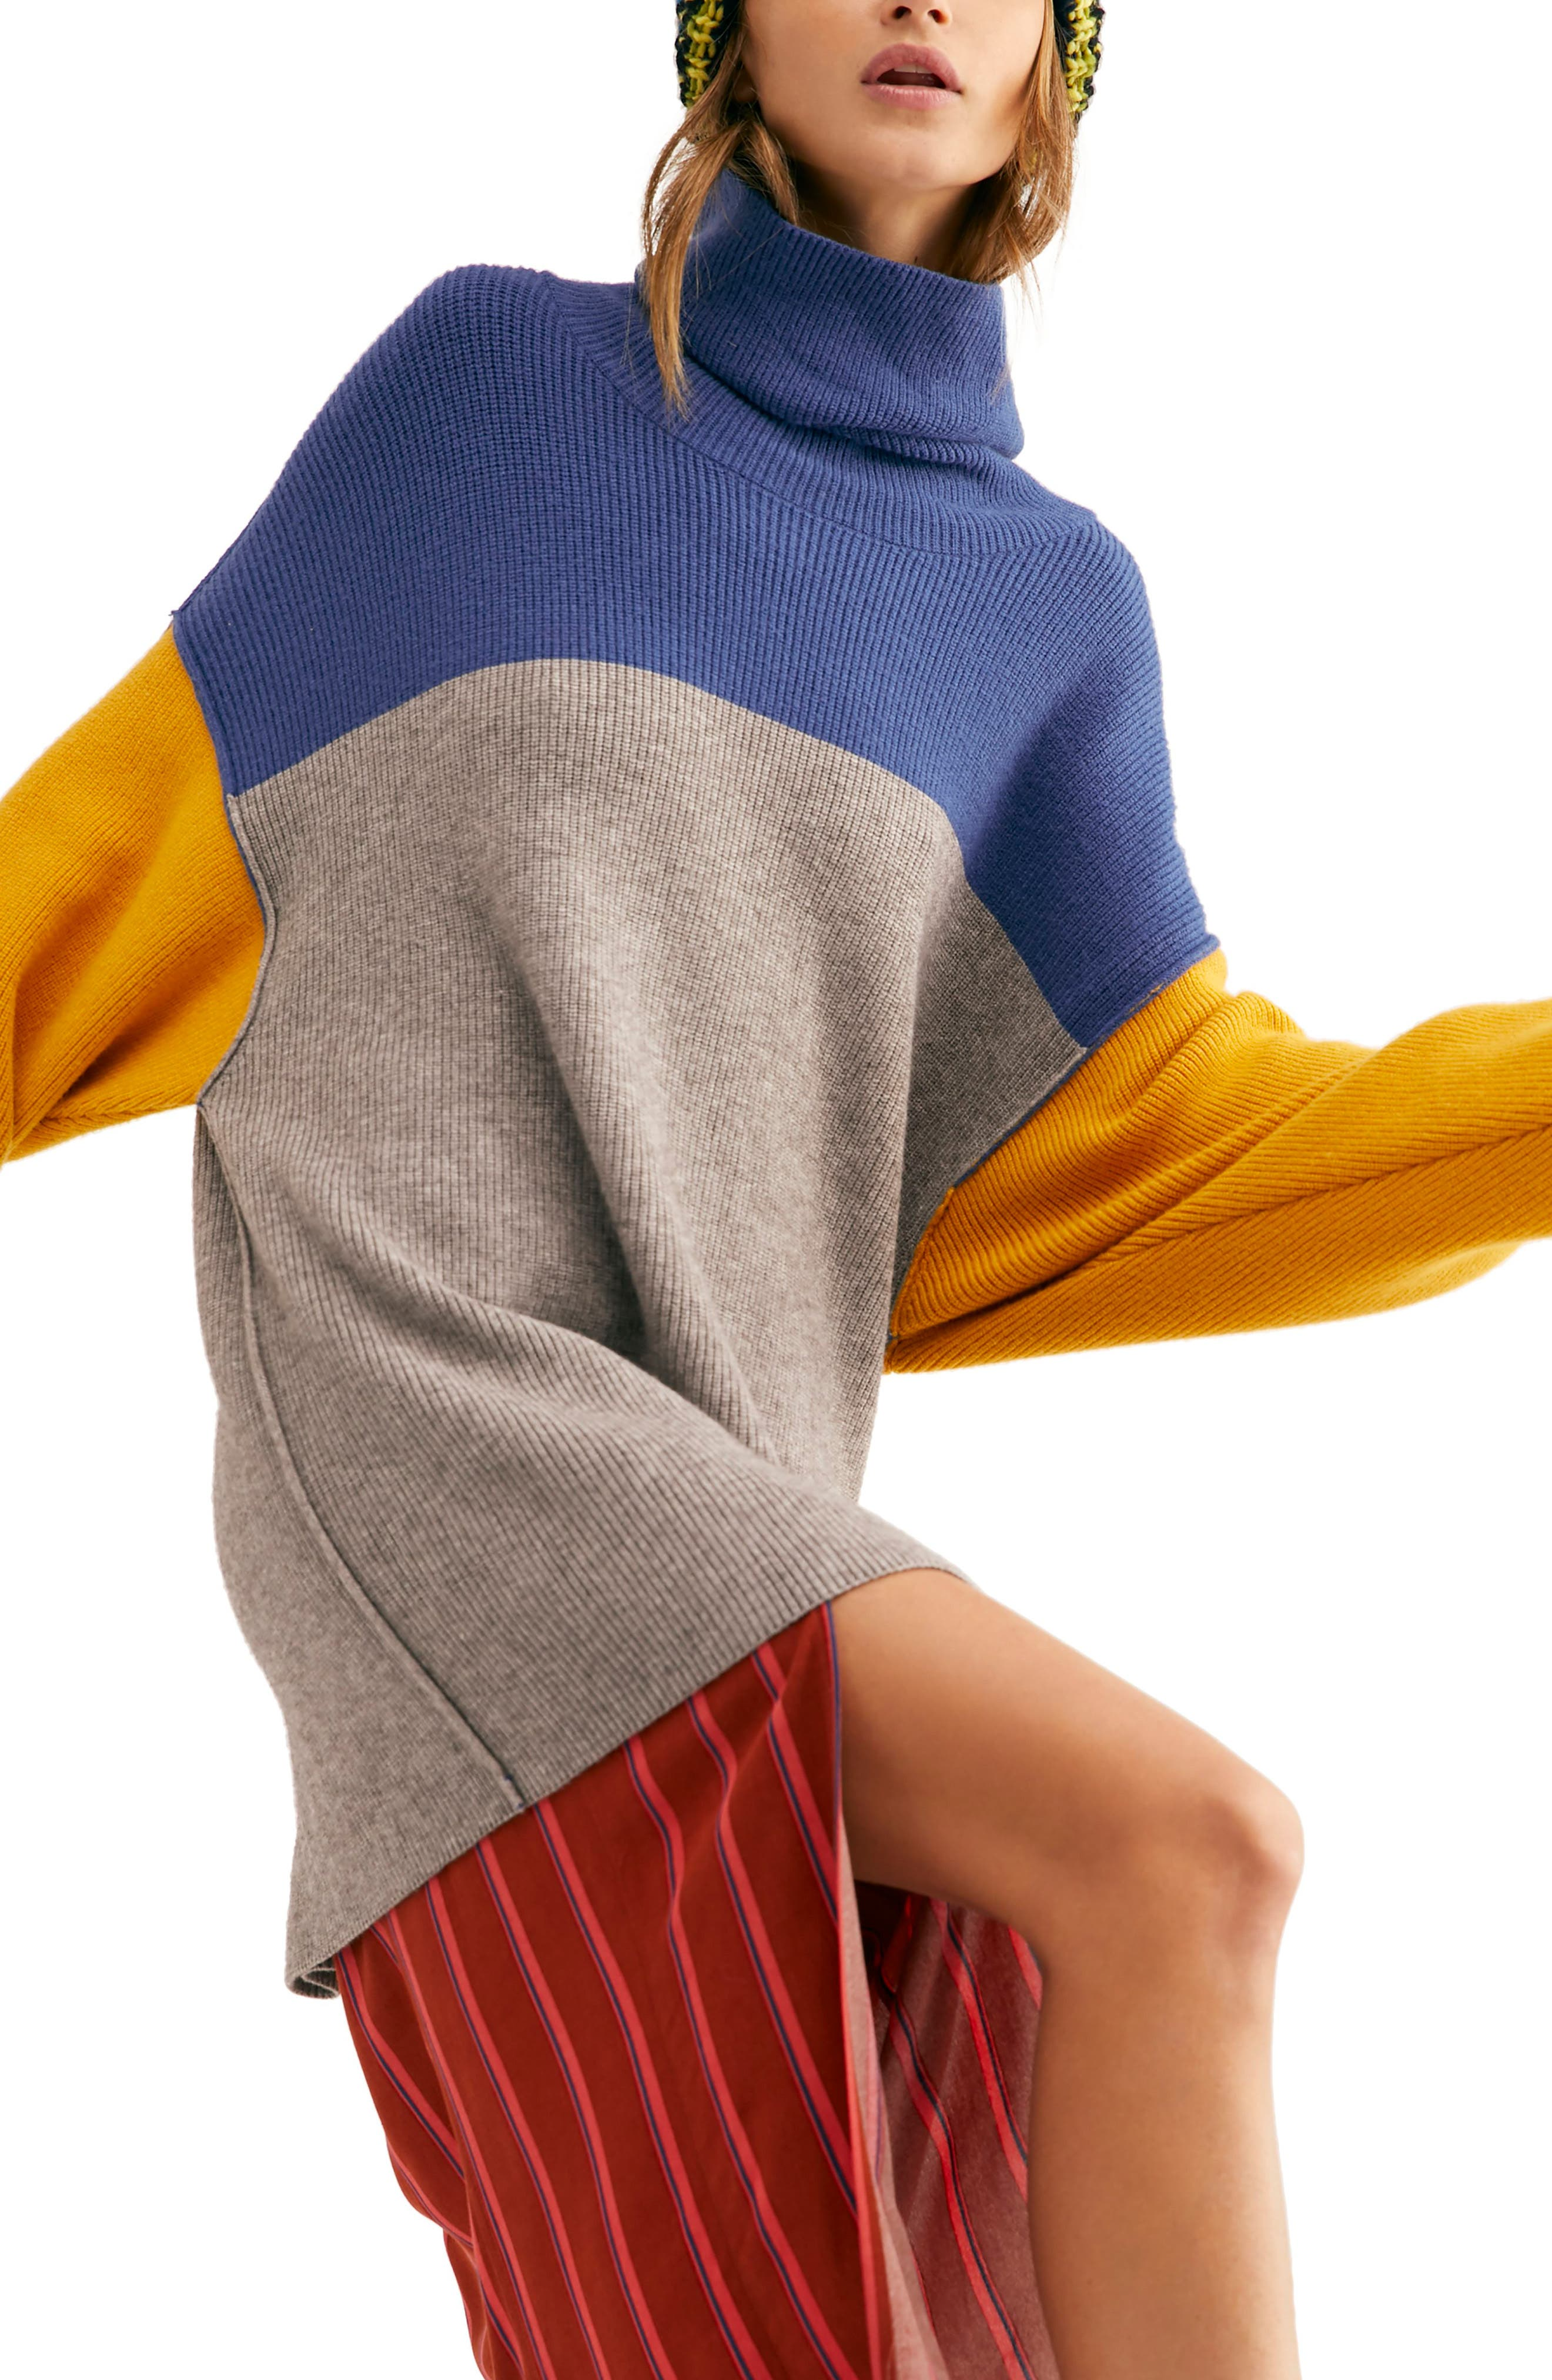 FREE PEOPLE, Colorblock Turtleneck Sweater, Alternate thumbnail 3, color, 400